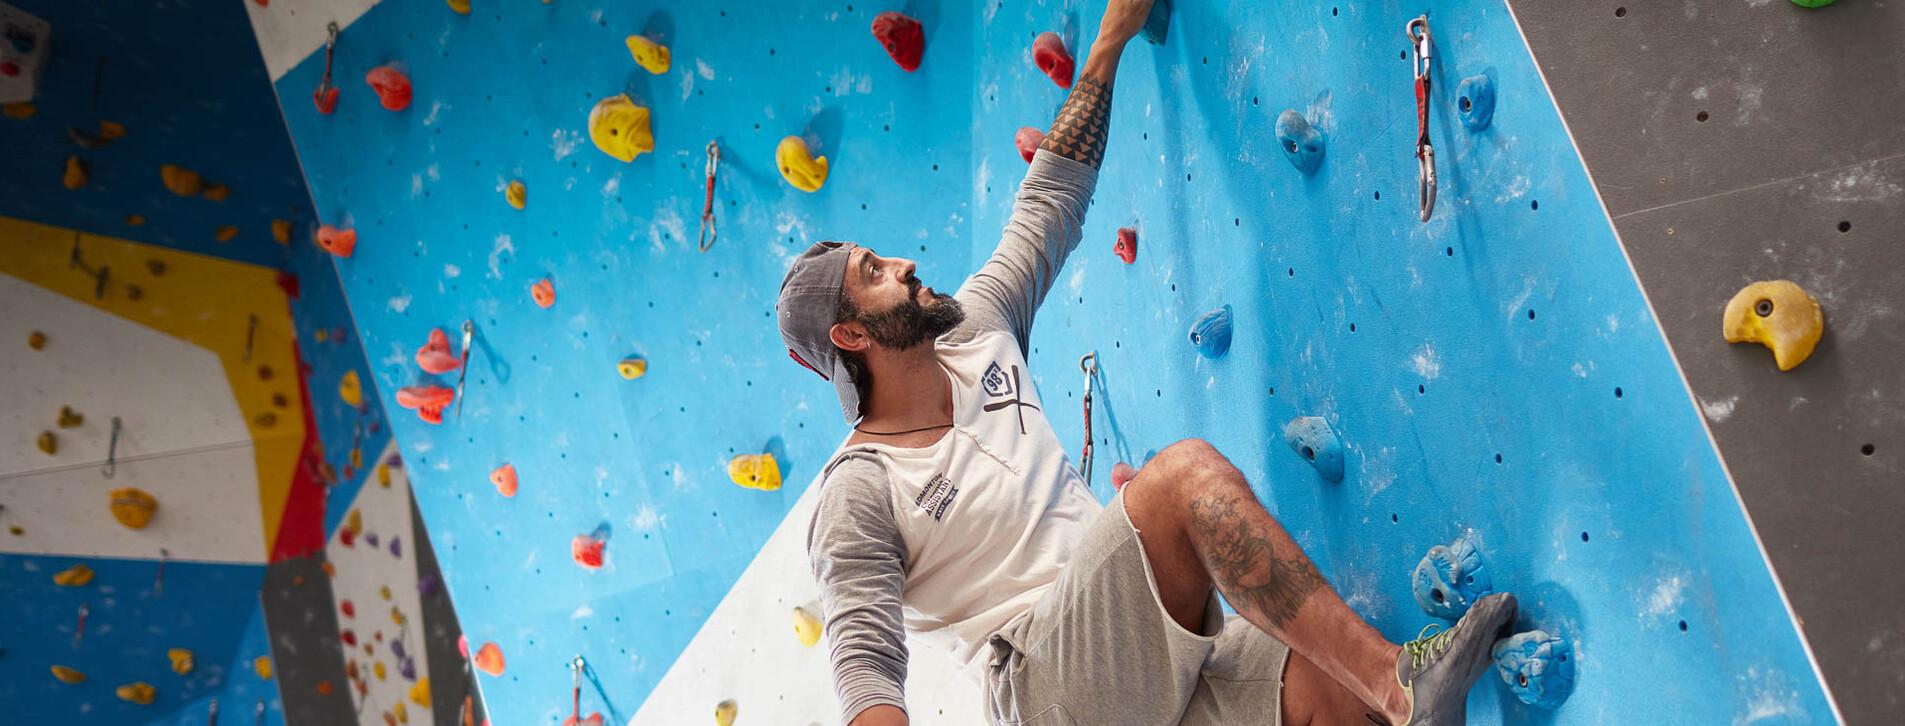 Фото 1 - Урок альпинизма на скалодроме